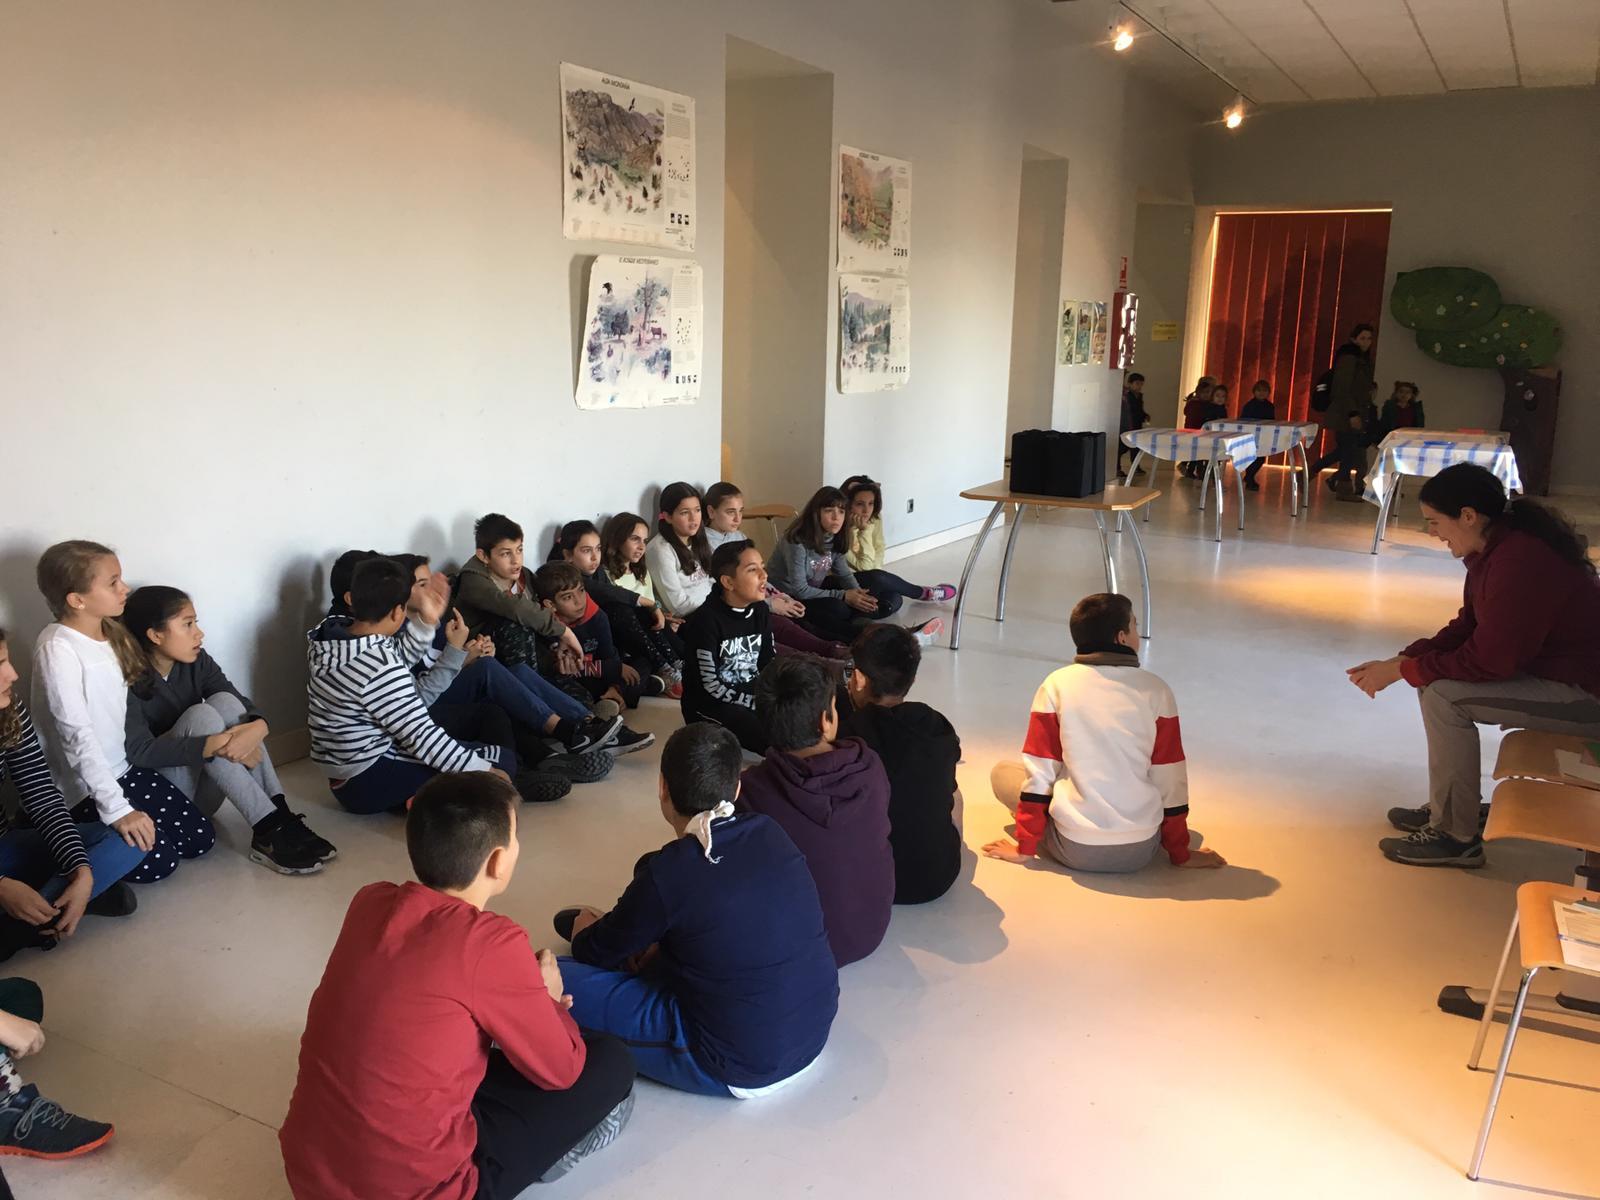 Centro de Interpretación de la Naturaleza. Montecarmelo. 6º curso. 23